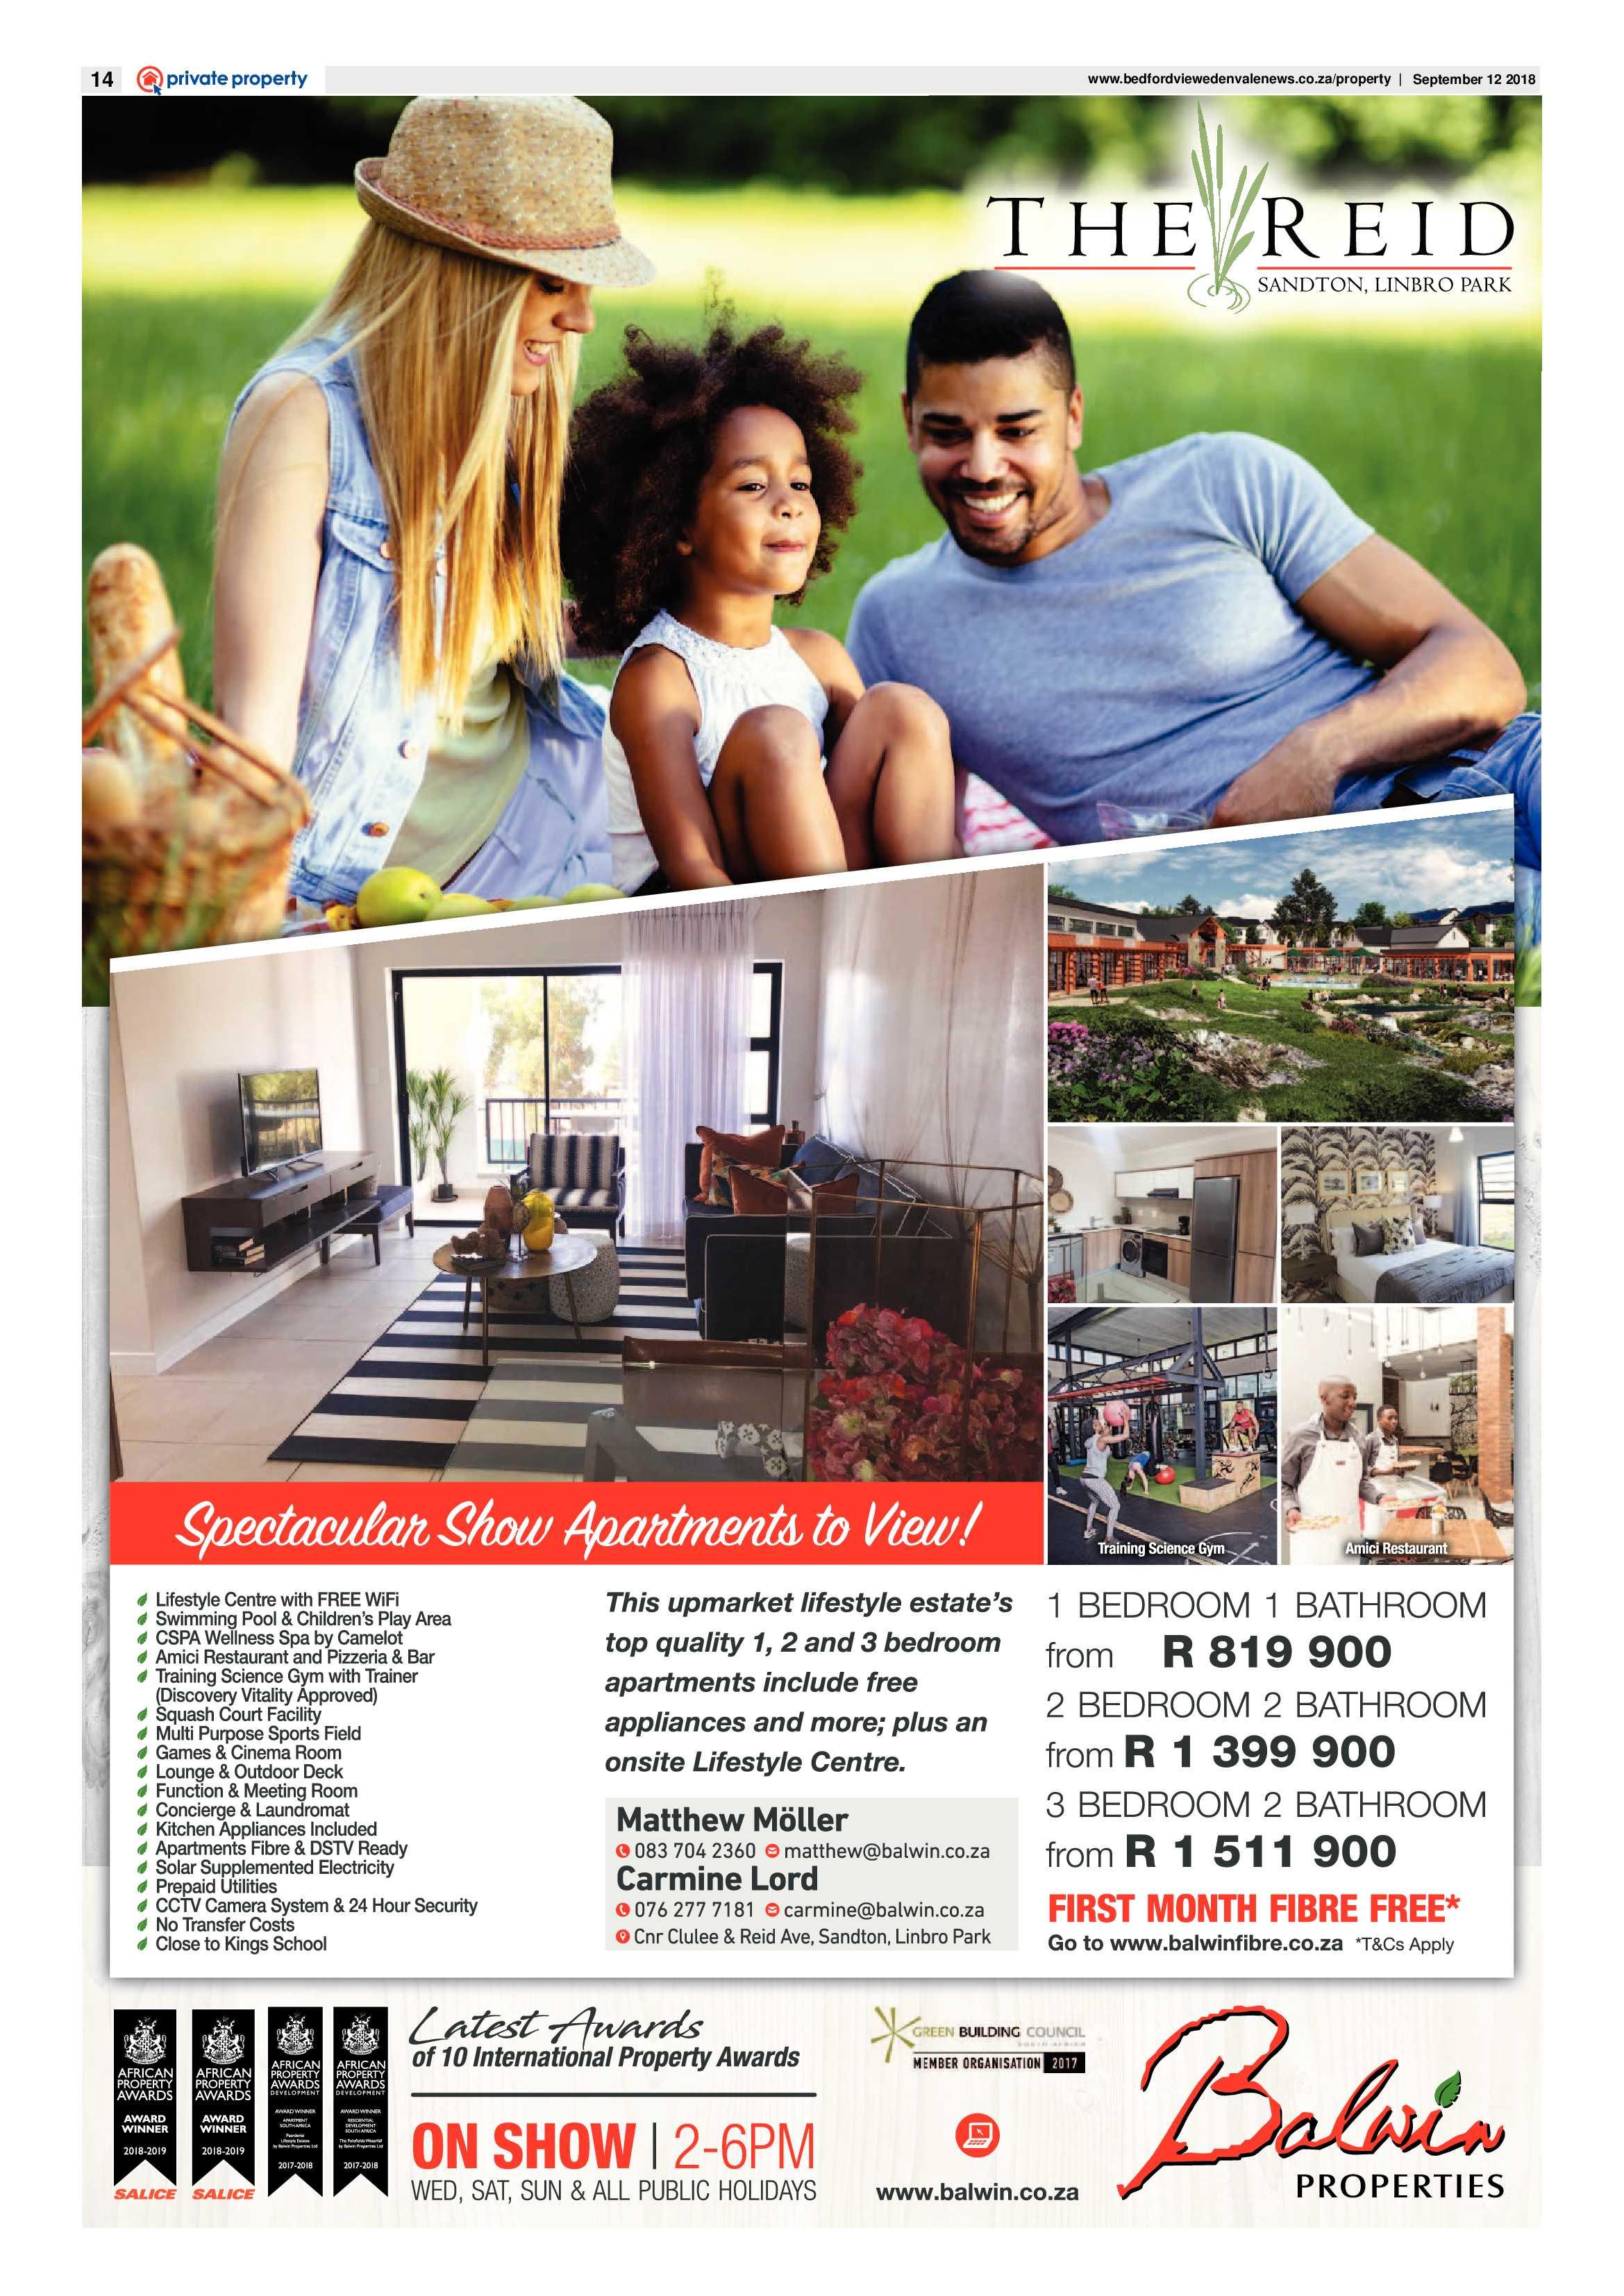 bedford-edenvale-12-september-2018-epapers-page-14